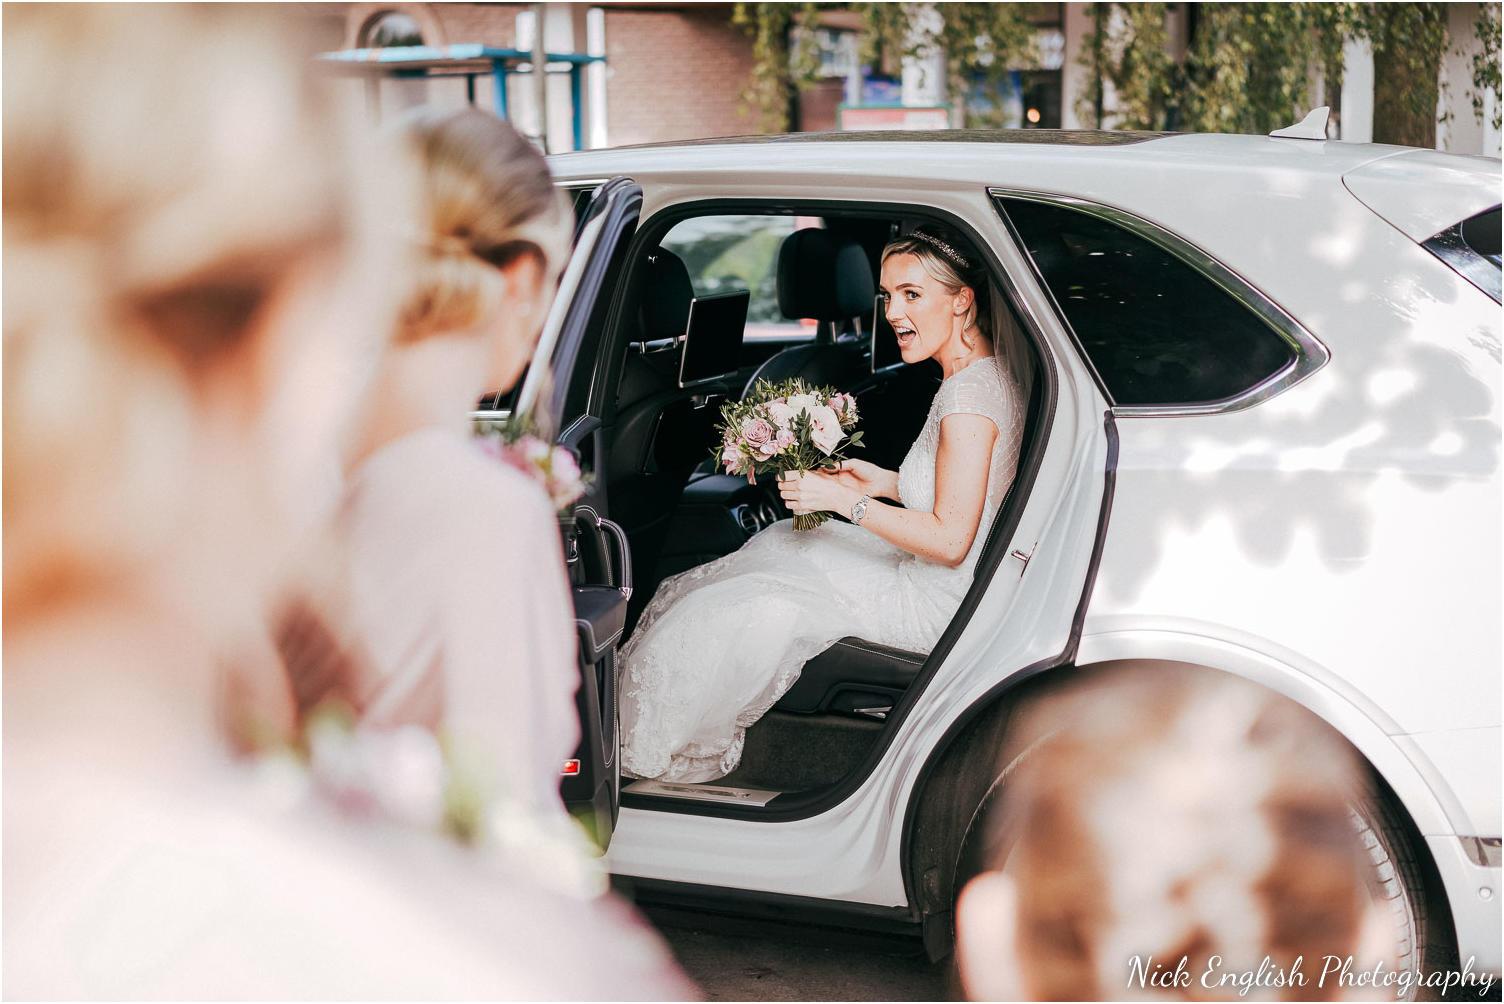 Mitton_Hall_Wedding_Photograph-35.jpg